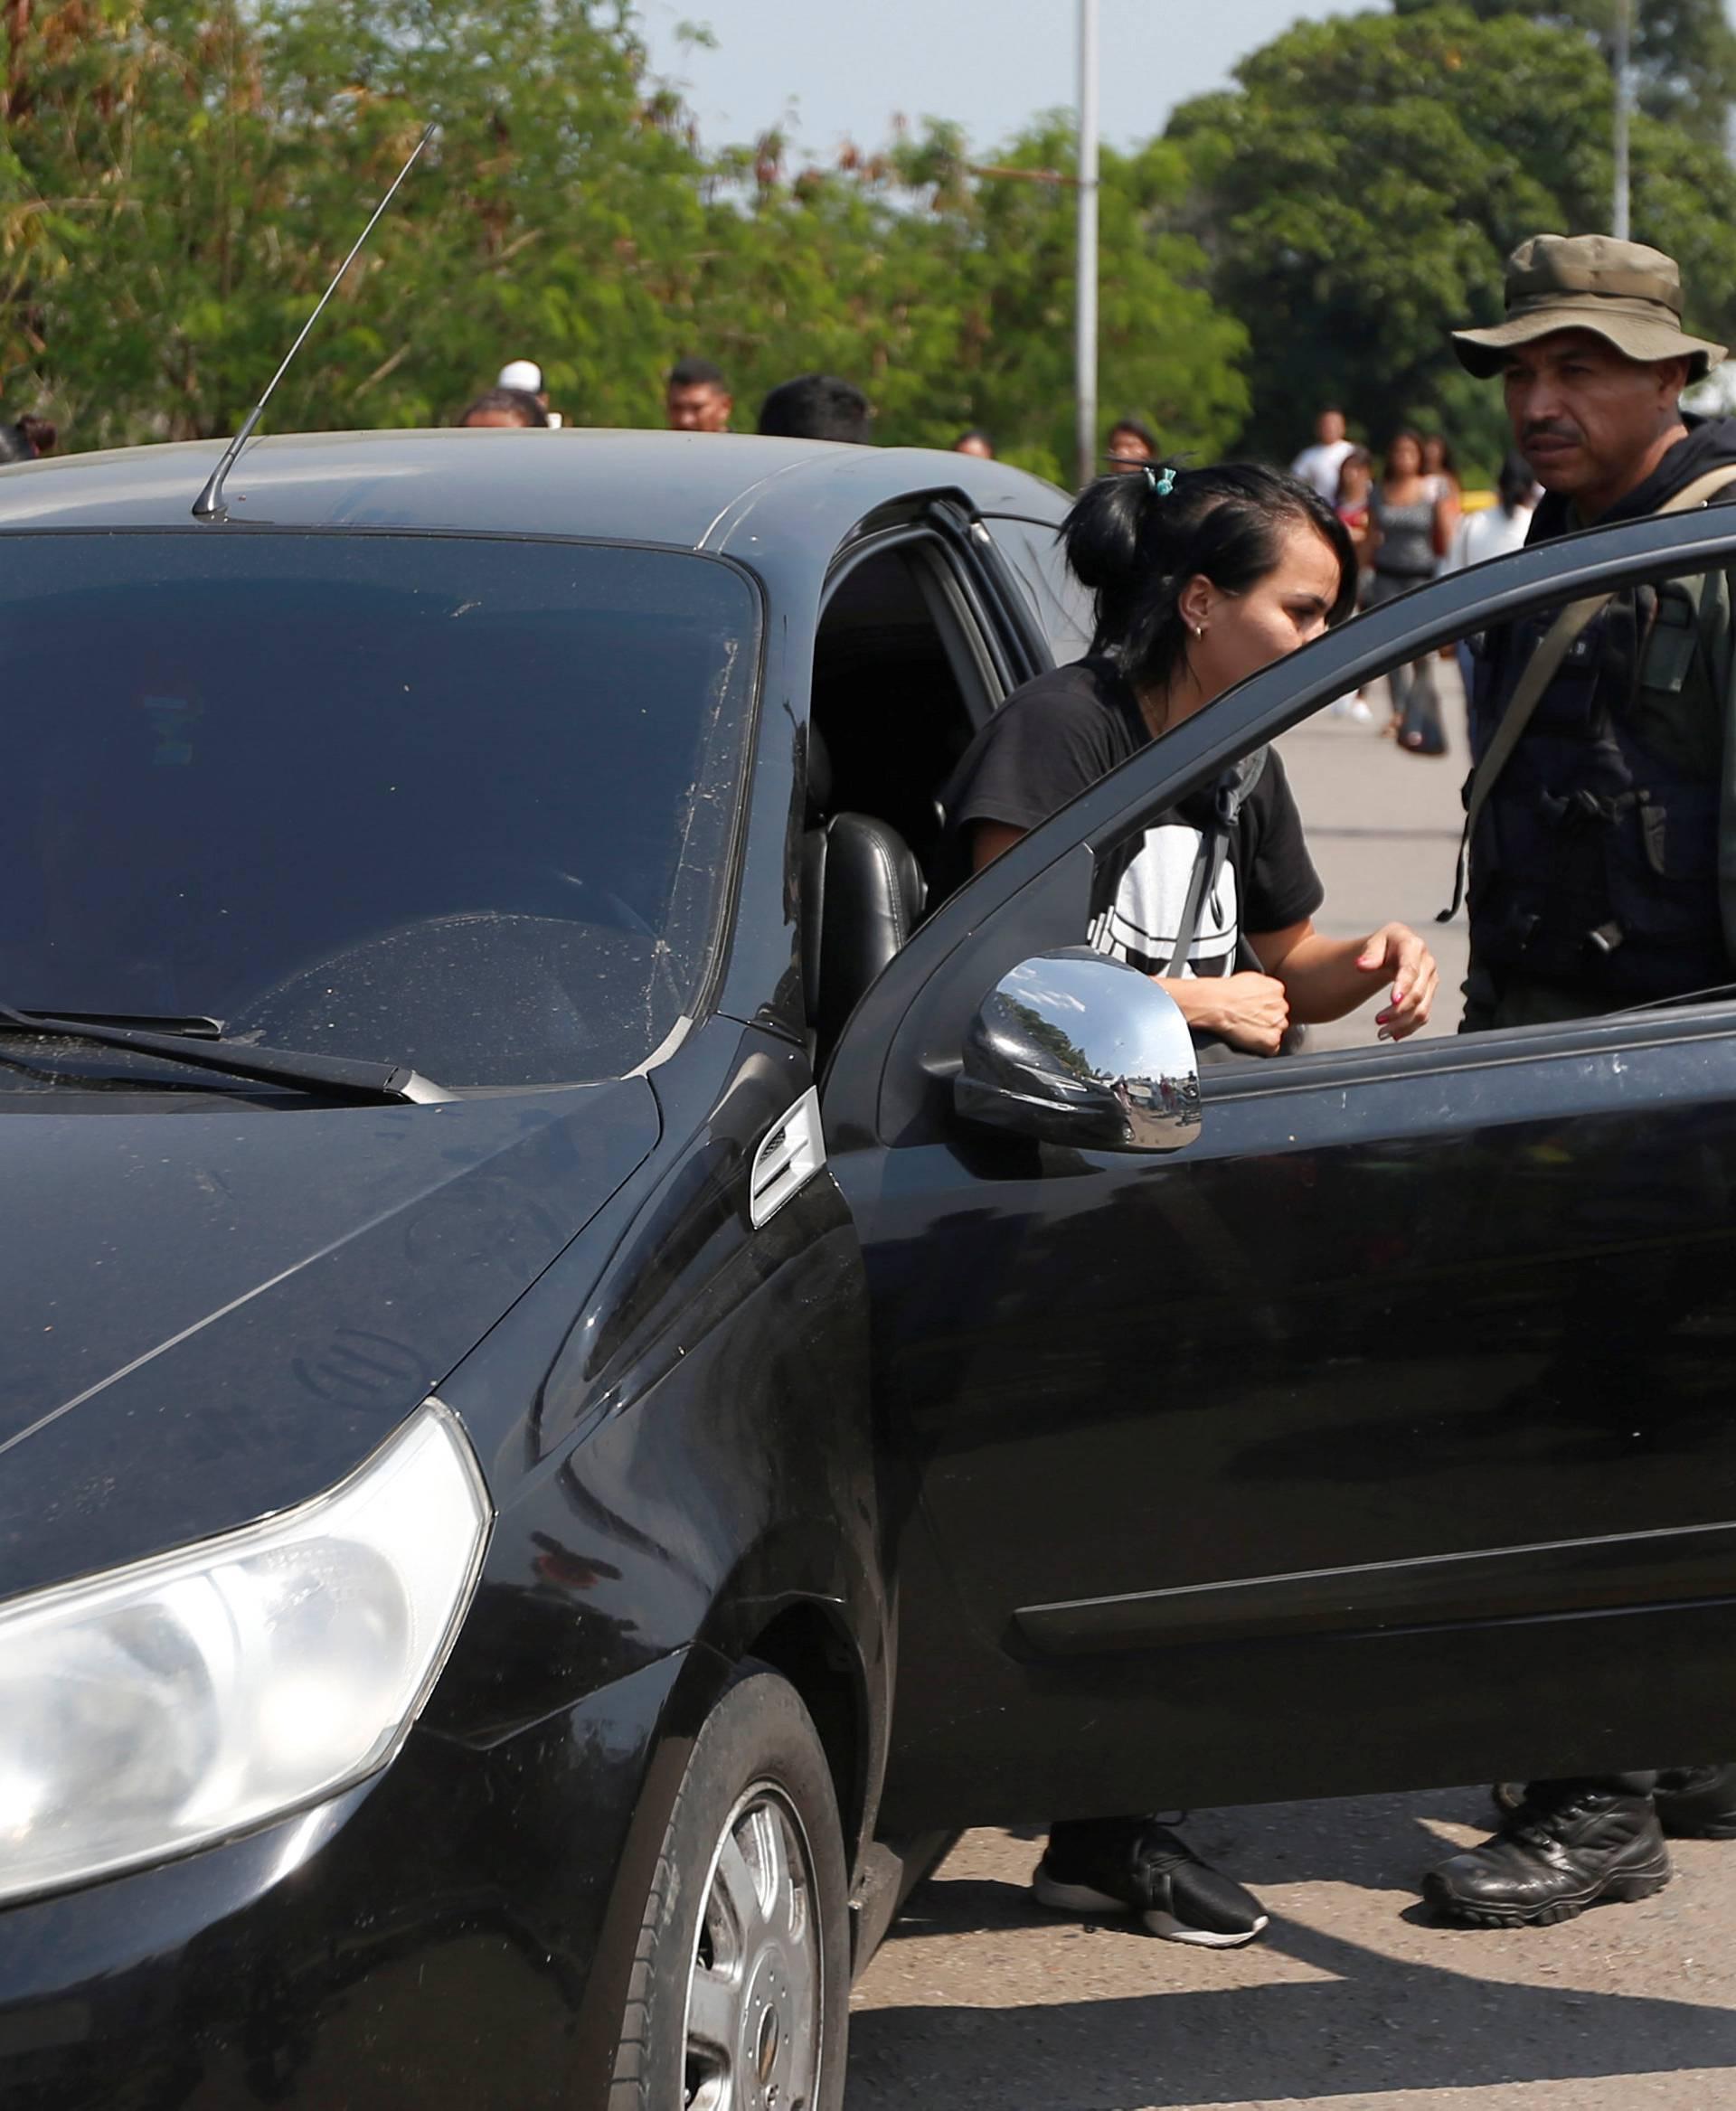 A woman gets out of her car at the request of a Venezuelan guard, on the Francisco de Paula Santander international bridge in Cucuta